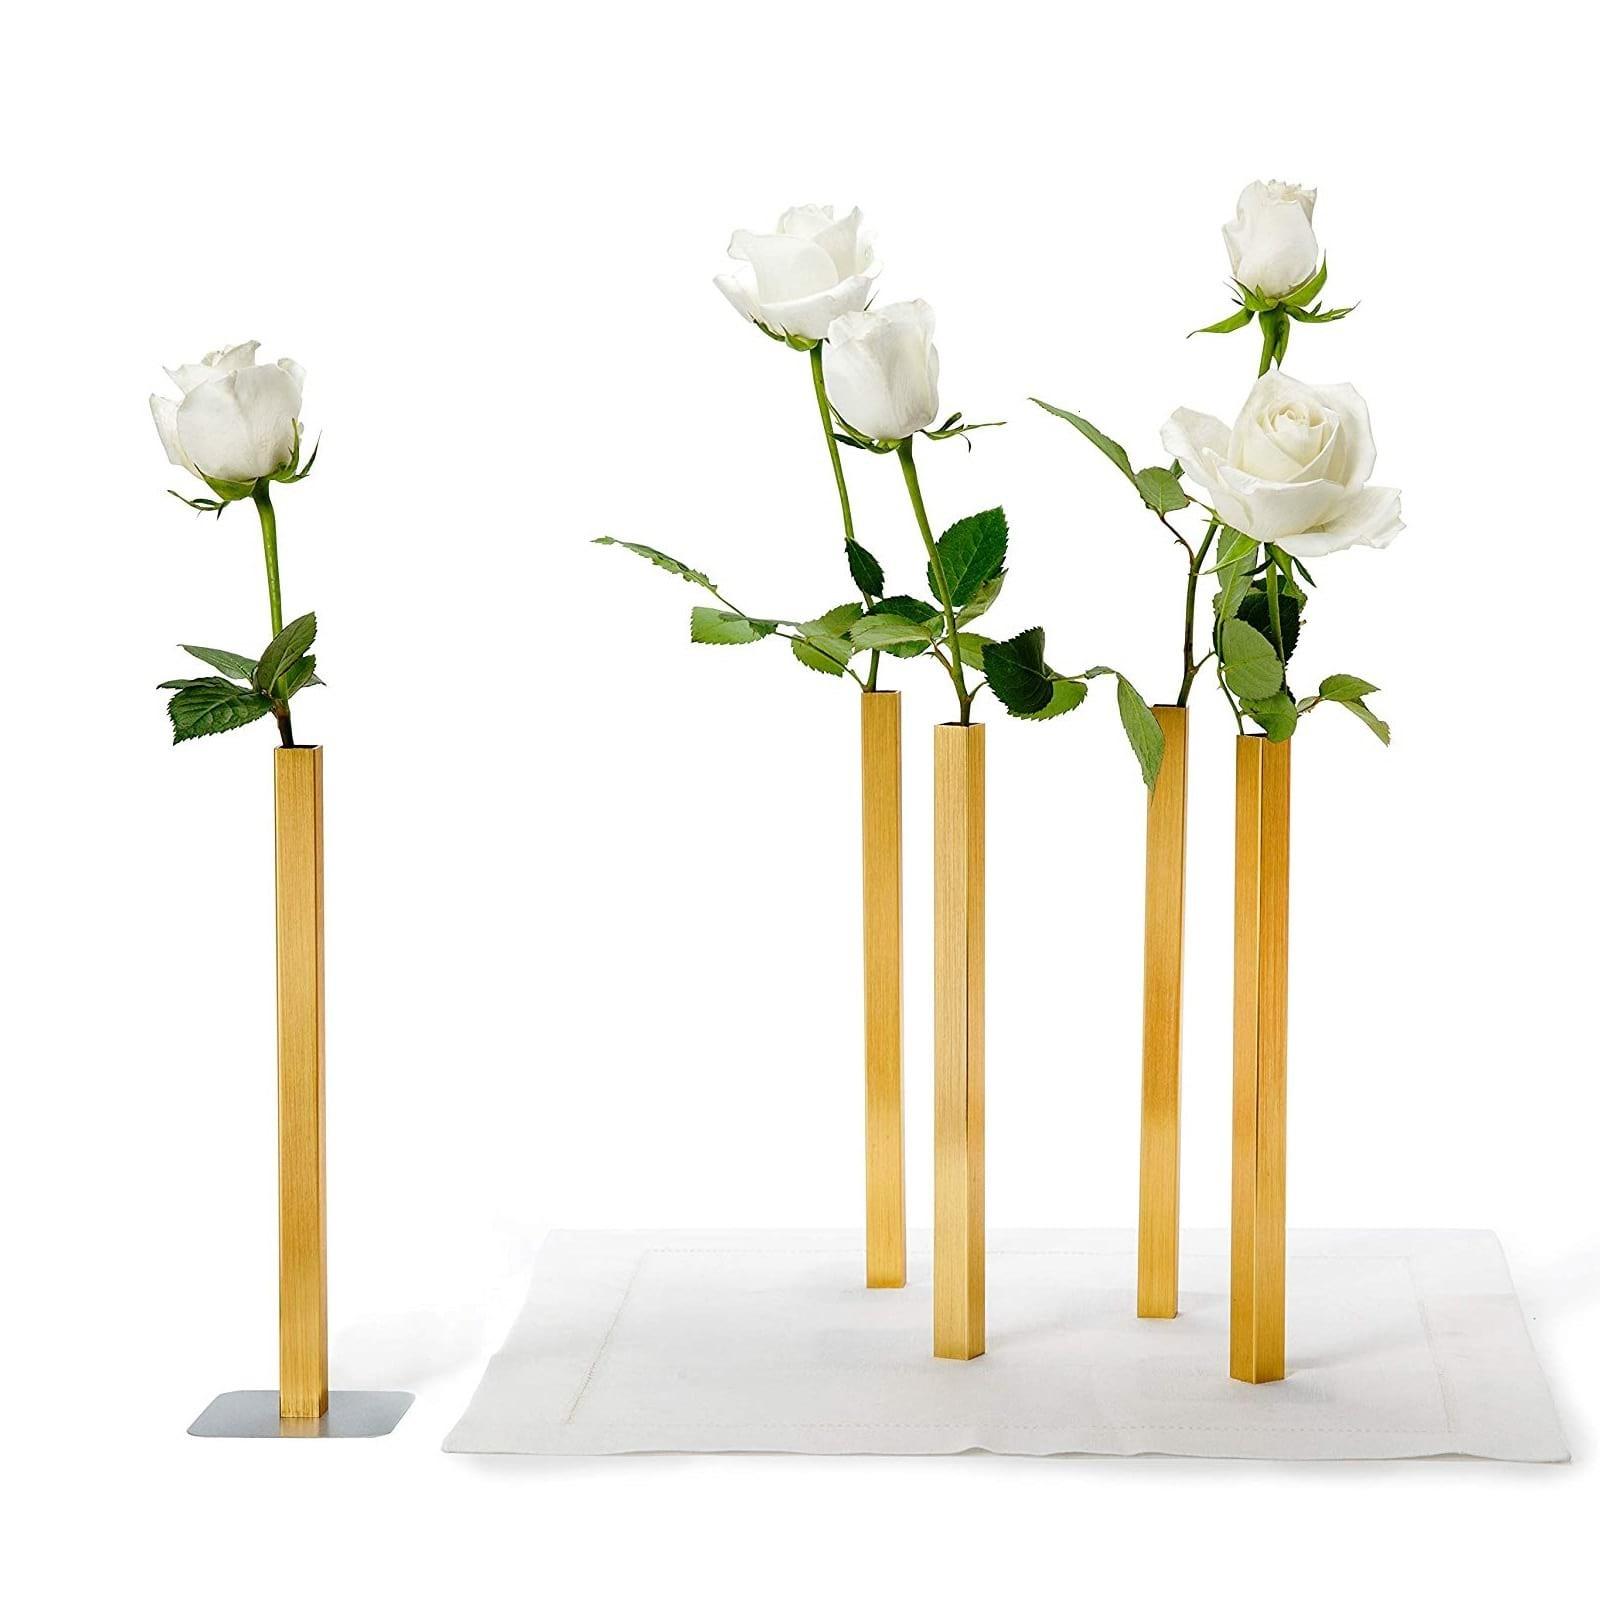 Magnetic Vase Μαγνητικά Βάζα Αλουμινίου Σετ των 5 (Χάλκινο) - Peleg Design